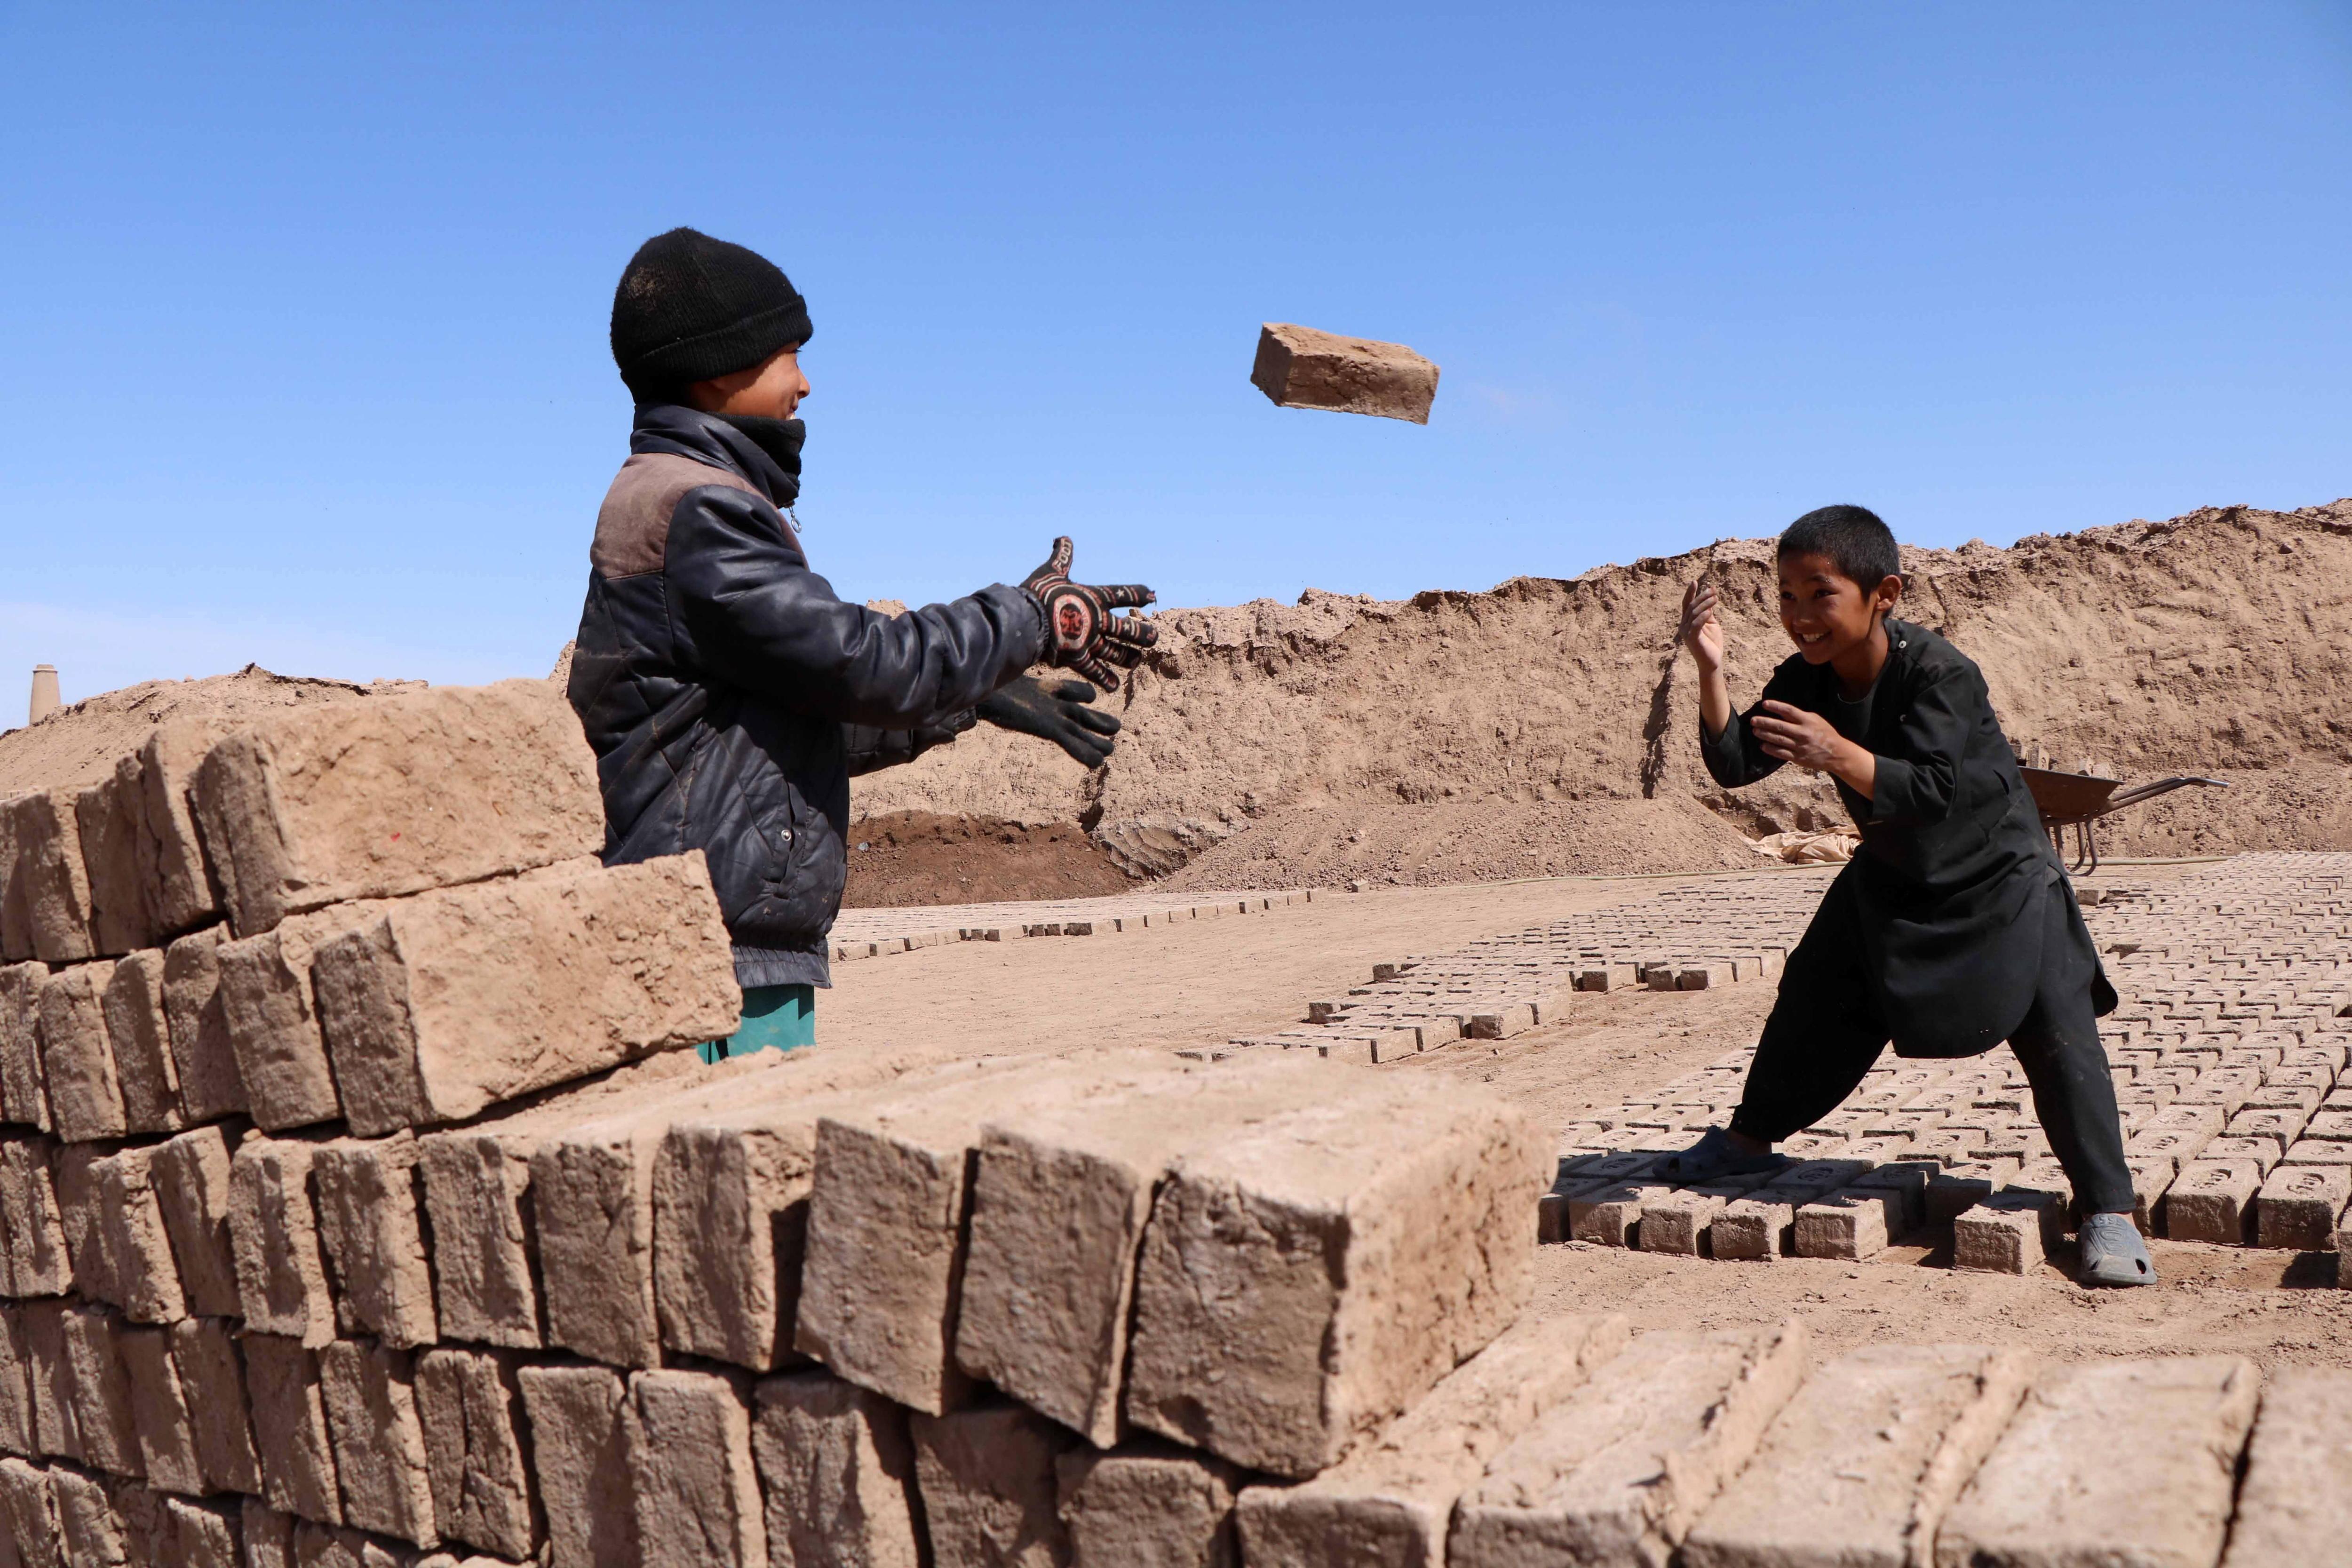 Diversos nins afganesos treballen en un forn de maons a Herat (Afganistan). /JALIL REZAYEE